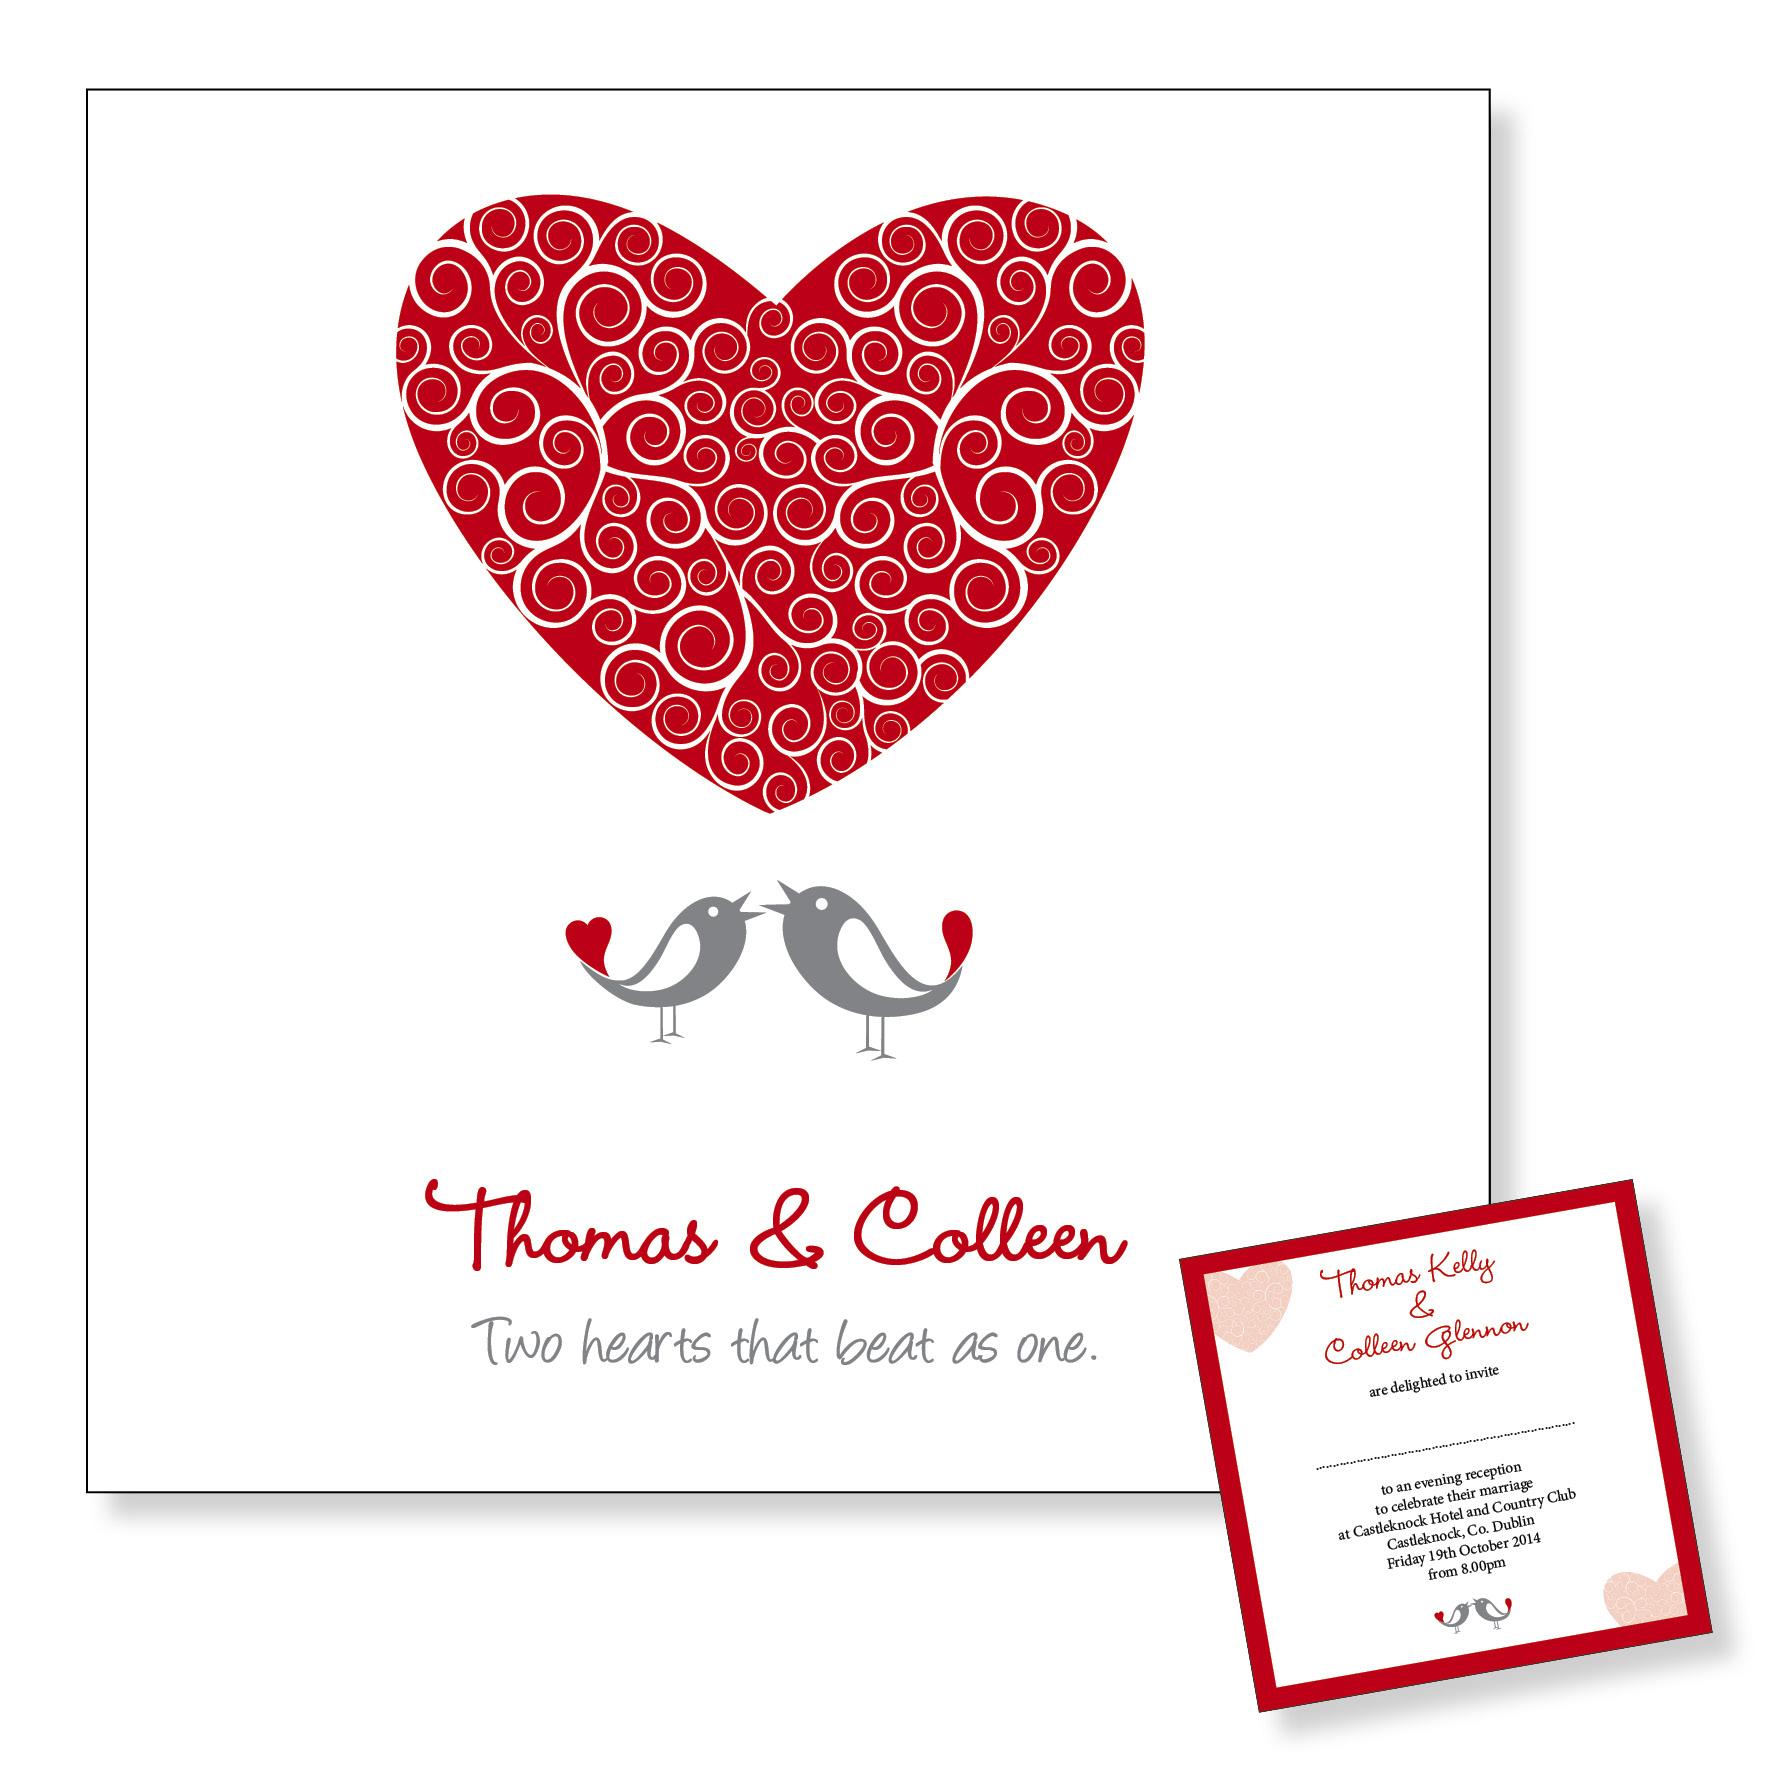 Evening wedding invitation - Love birds